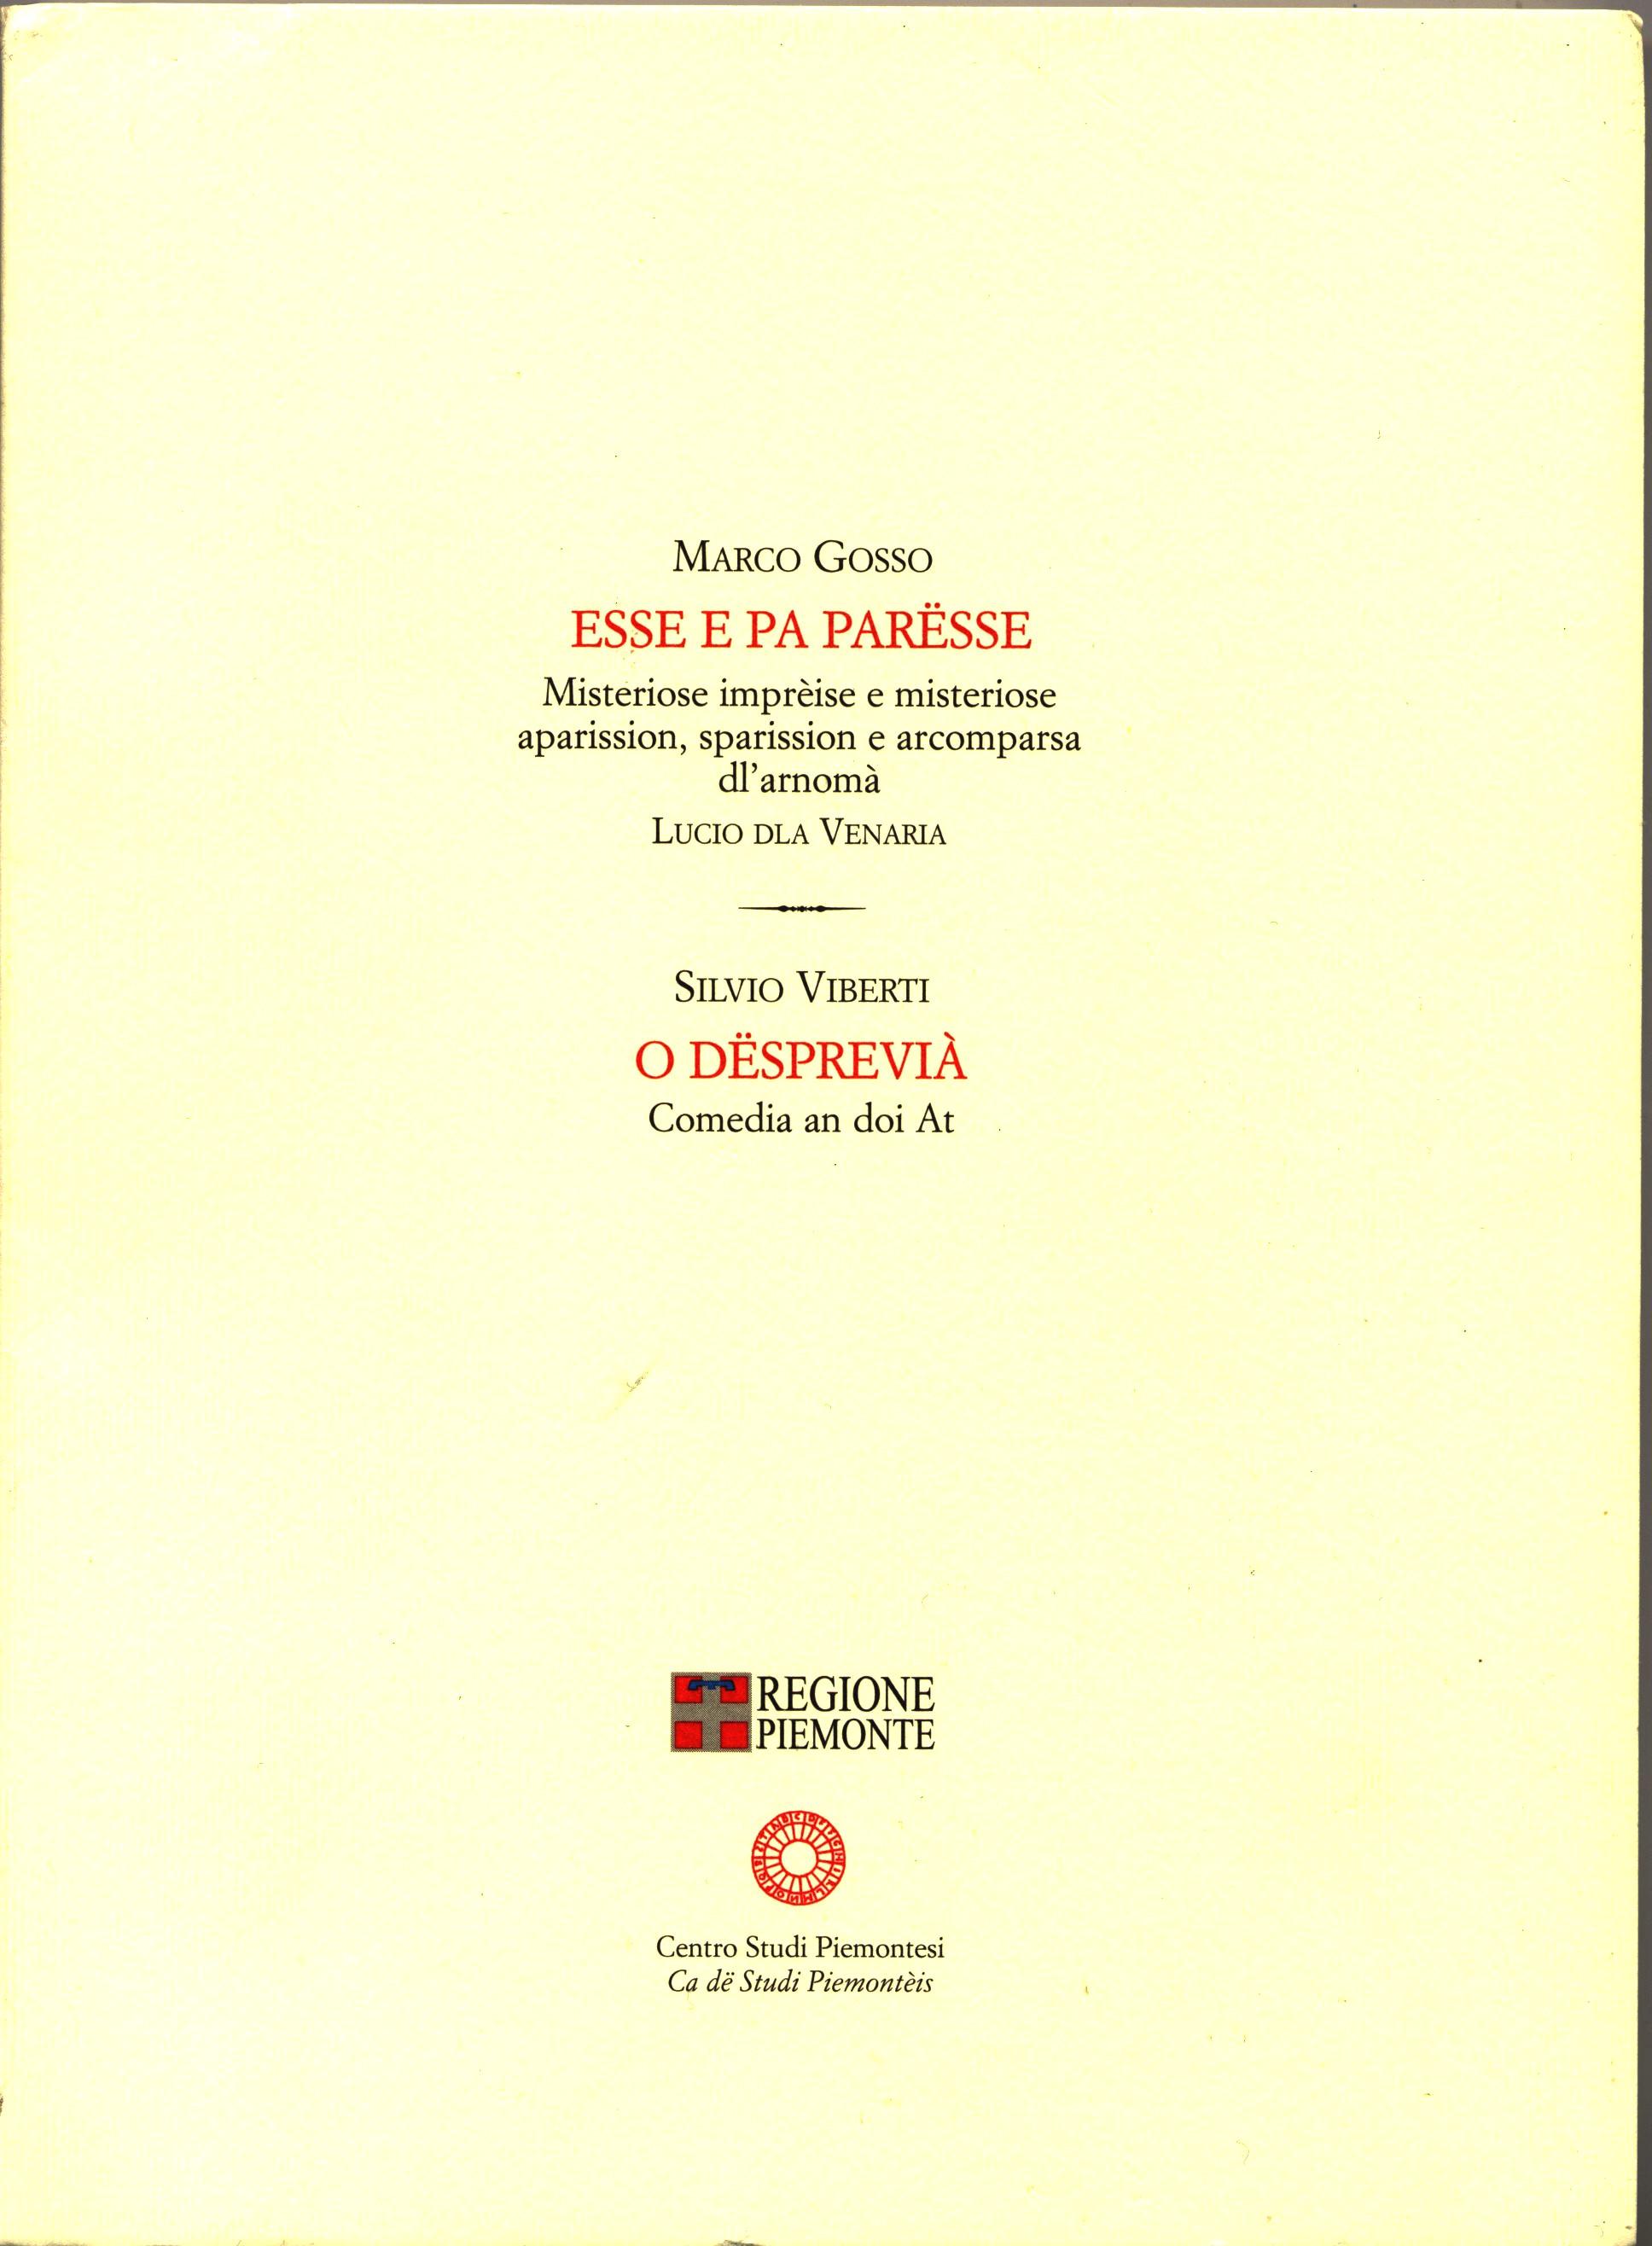 Esse e pa parësse/Marco Grosso - O dësprevià/Silvio Viberti